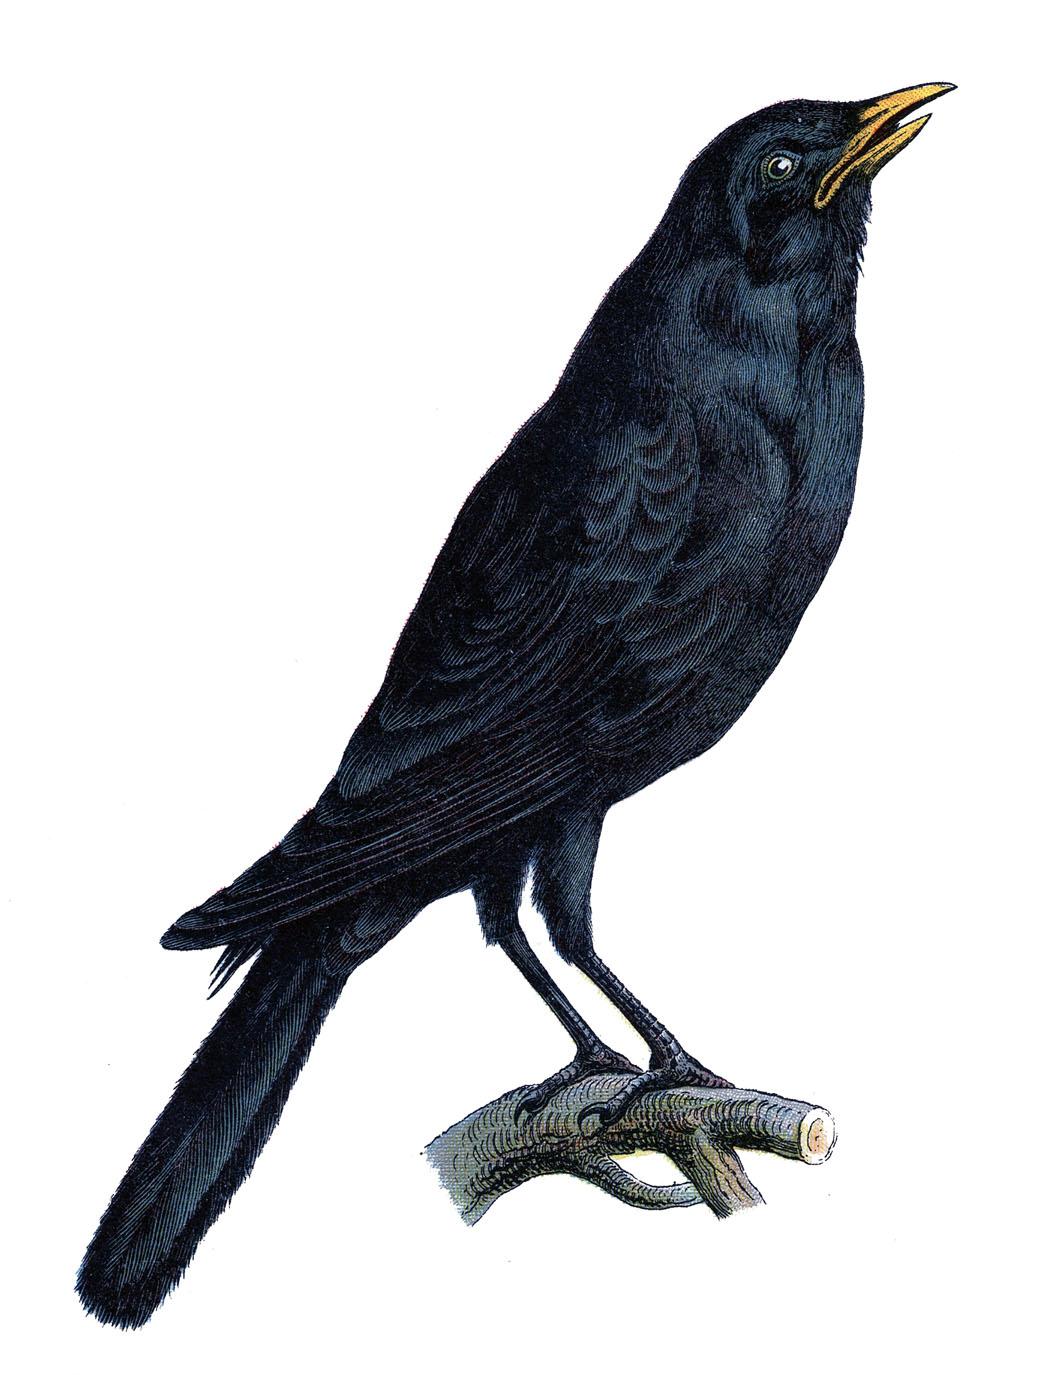 King Penguin Tattoo Razorbills Line Art PNG, Clipart, Animals, Artwork,  Beak, Bird, Black And White Free